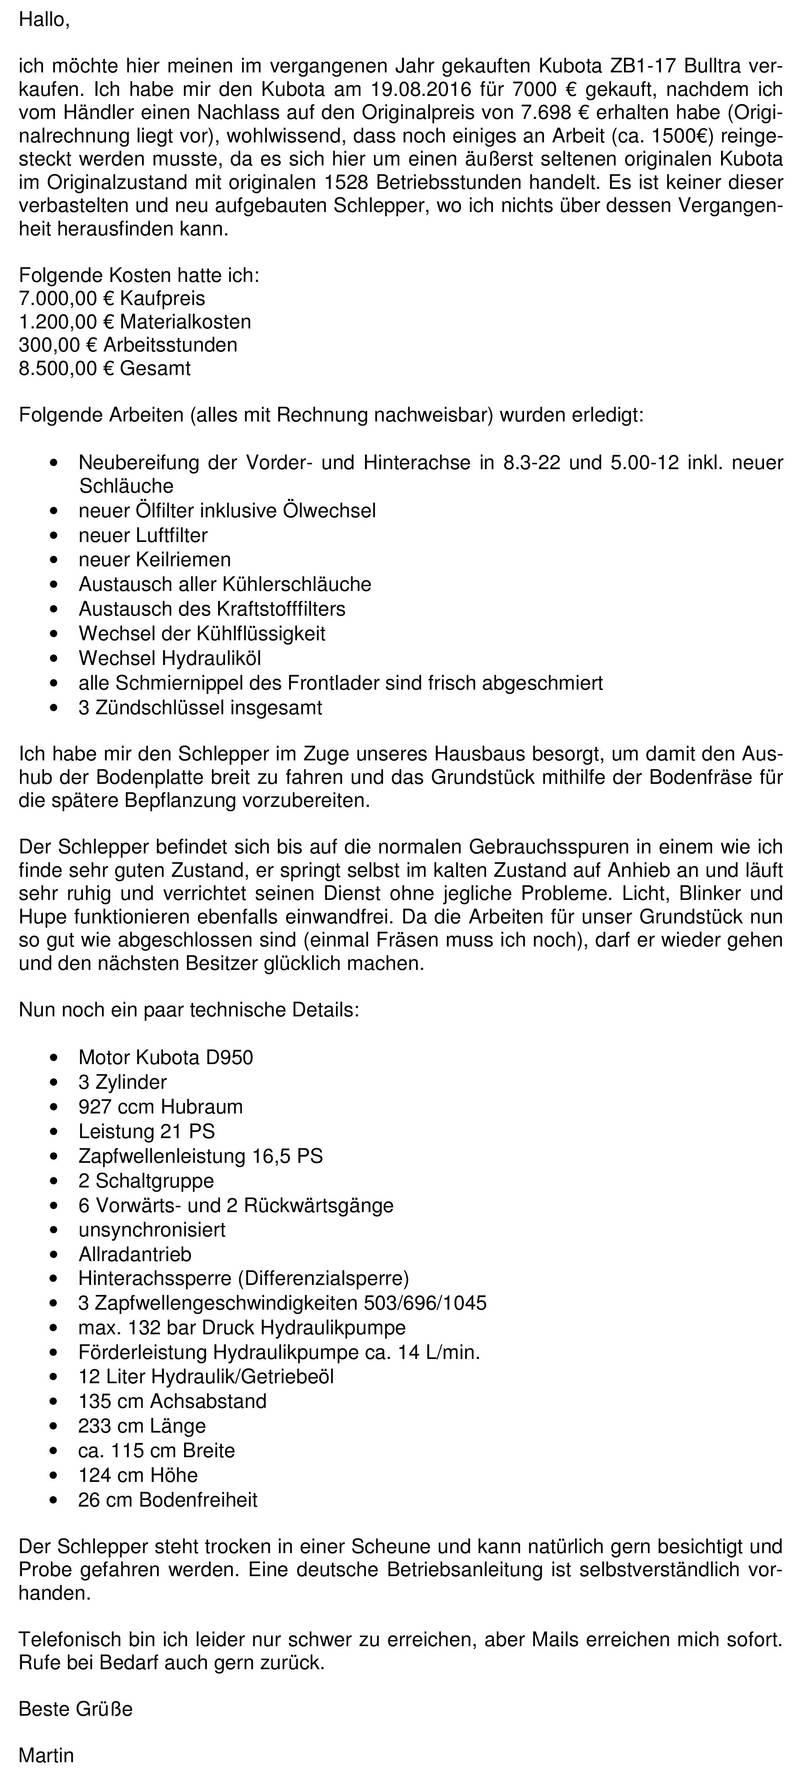 Old Fashioned Probe Freie Rechnung Collection - FORTSETZUNG ...